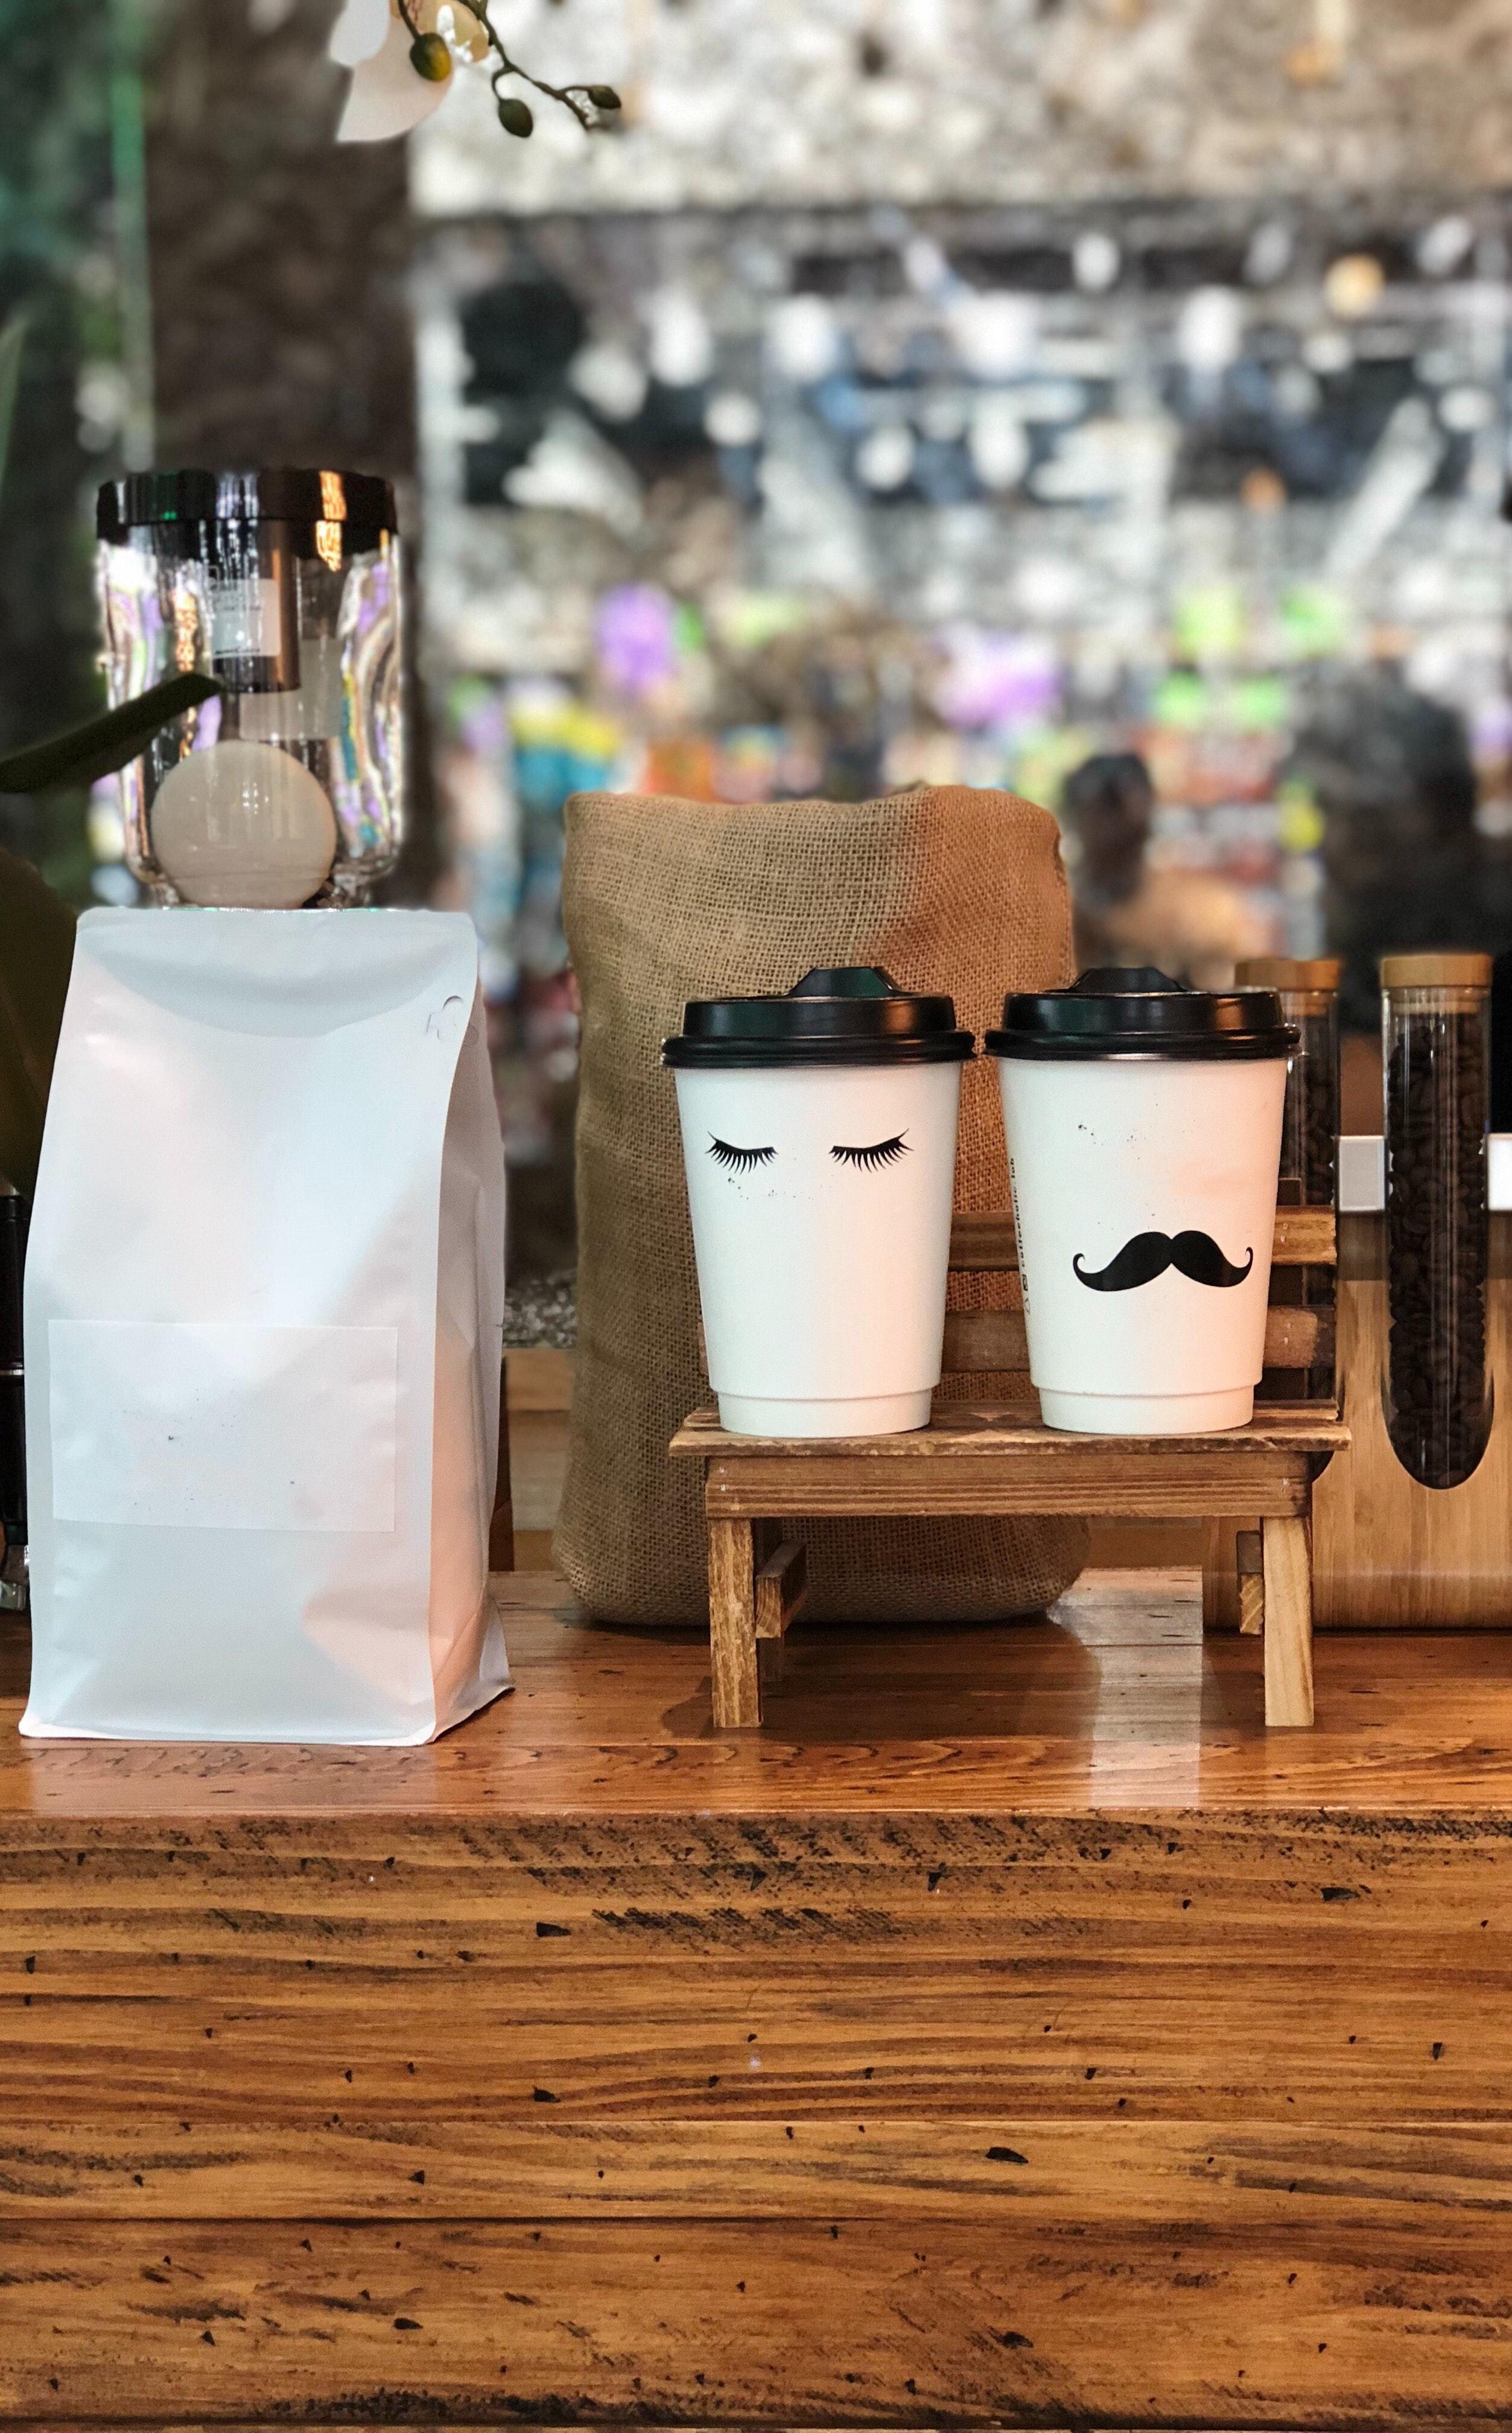 Free table drink coffee cup furniture drinkware